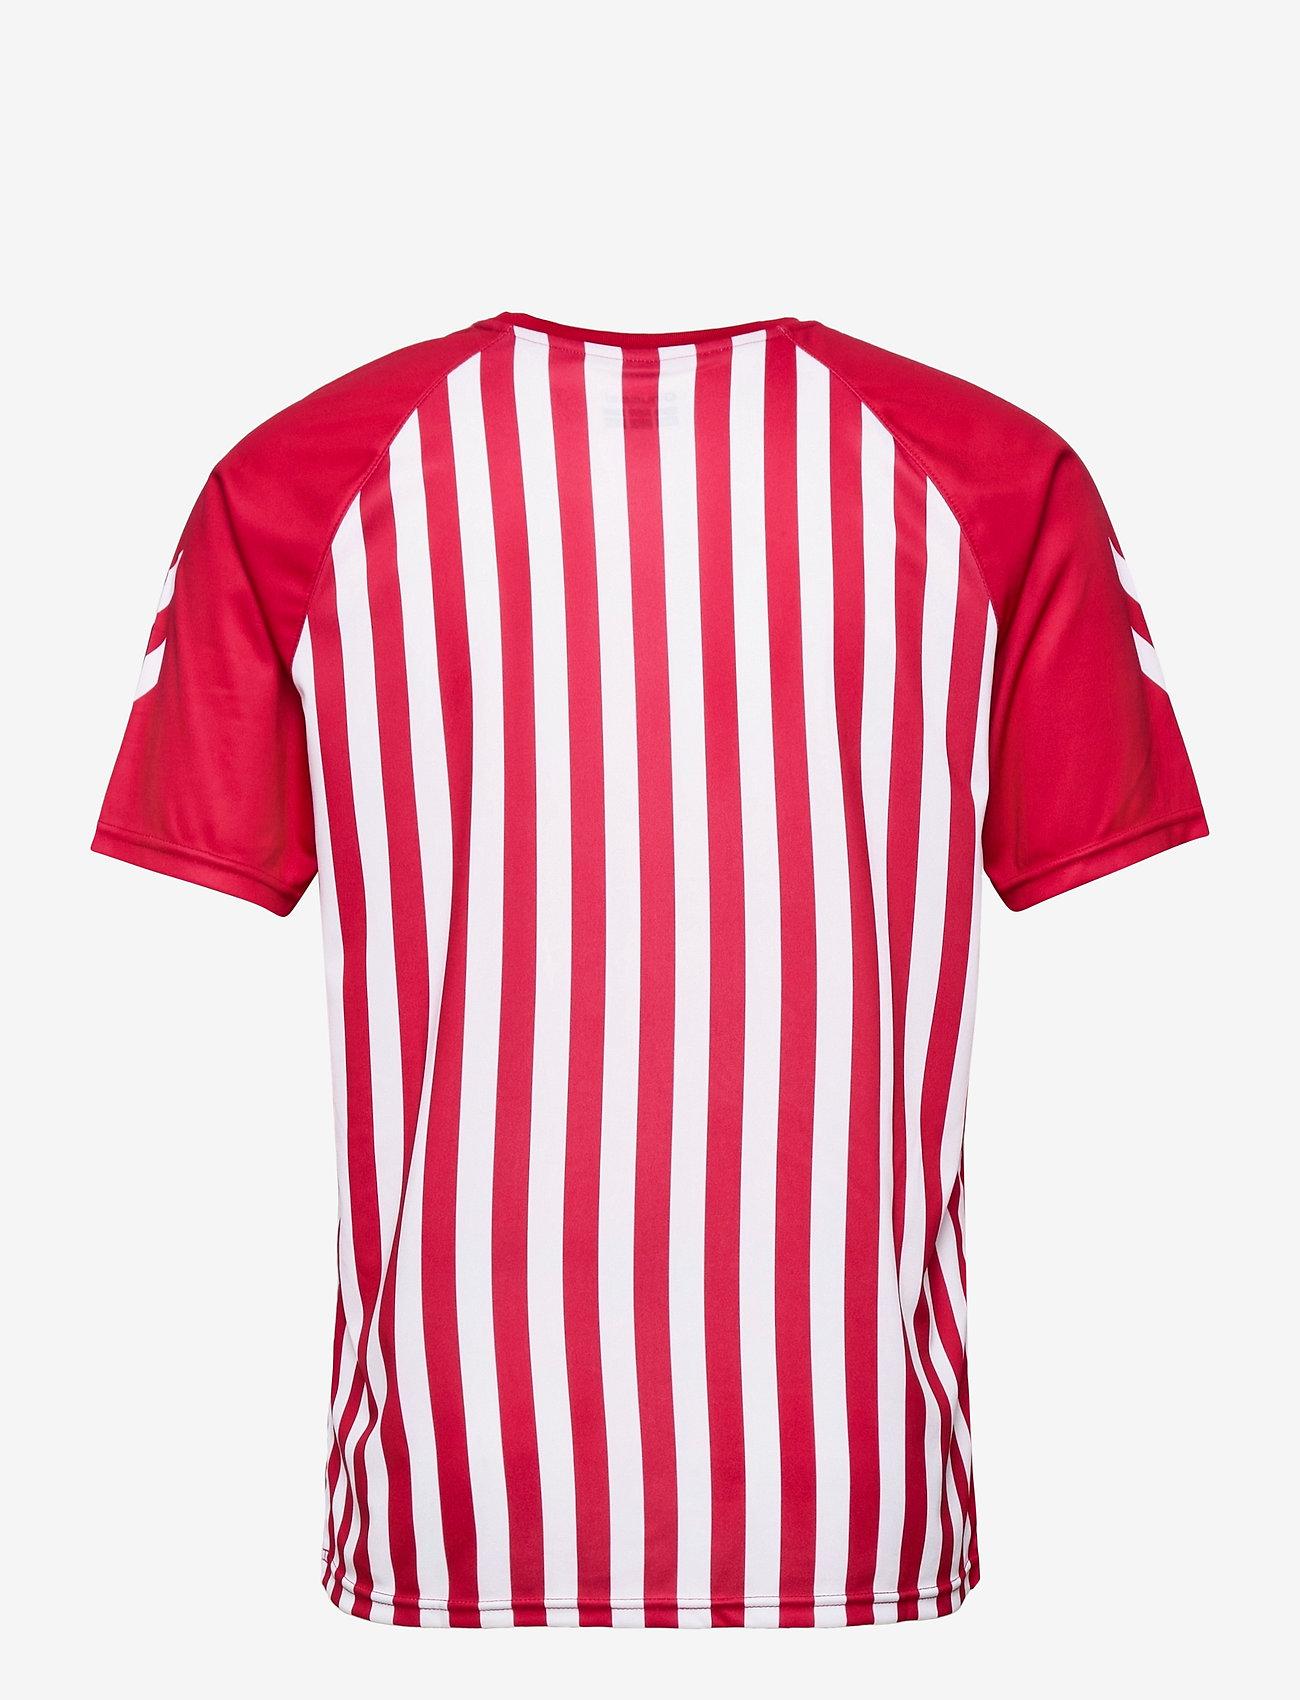 Hummel - DBU FAN 2020 RETRO TEE - football shirts - tango red/white - 1